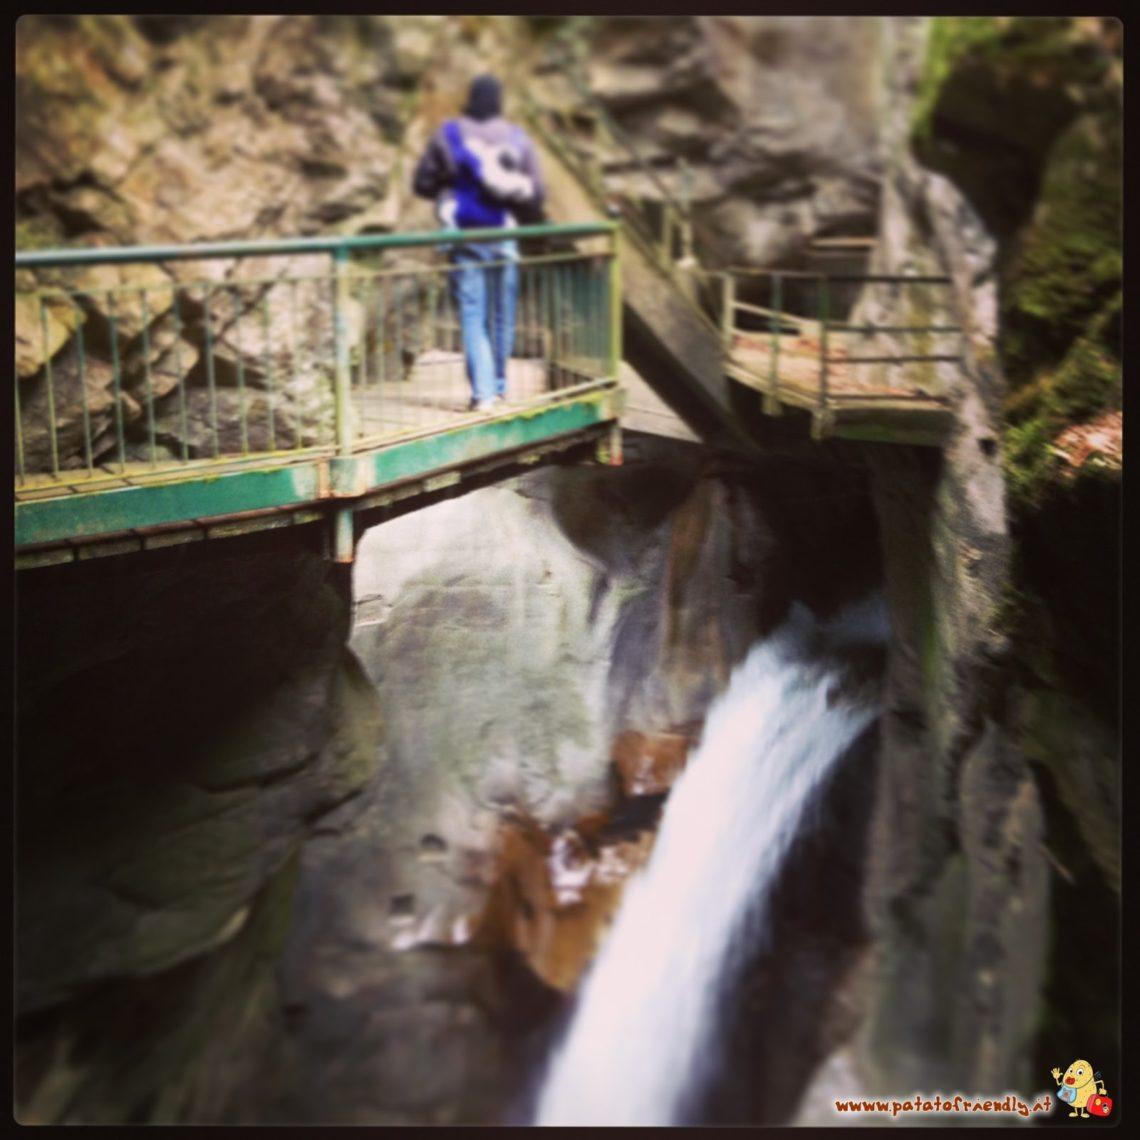 [cml_media_alt id='4630']Visitare l'Orrido di Bellan[/cml_media_alt]